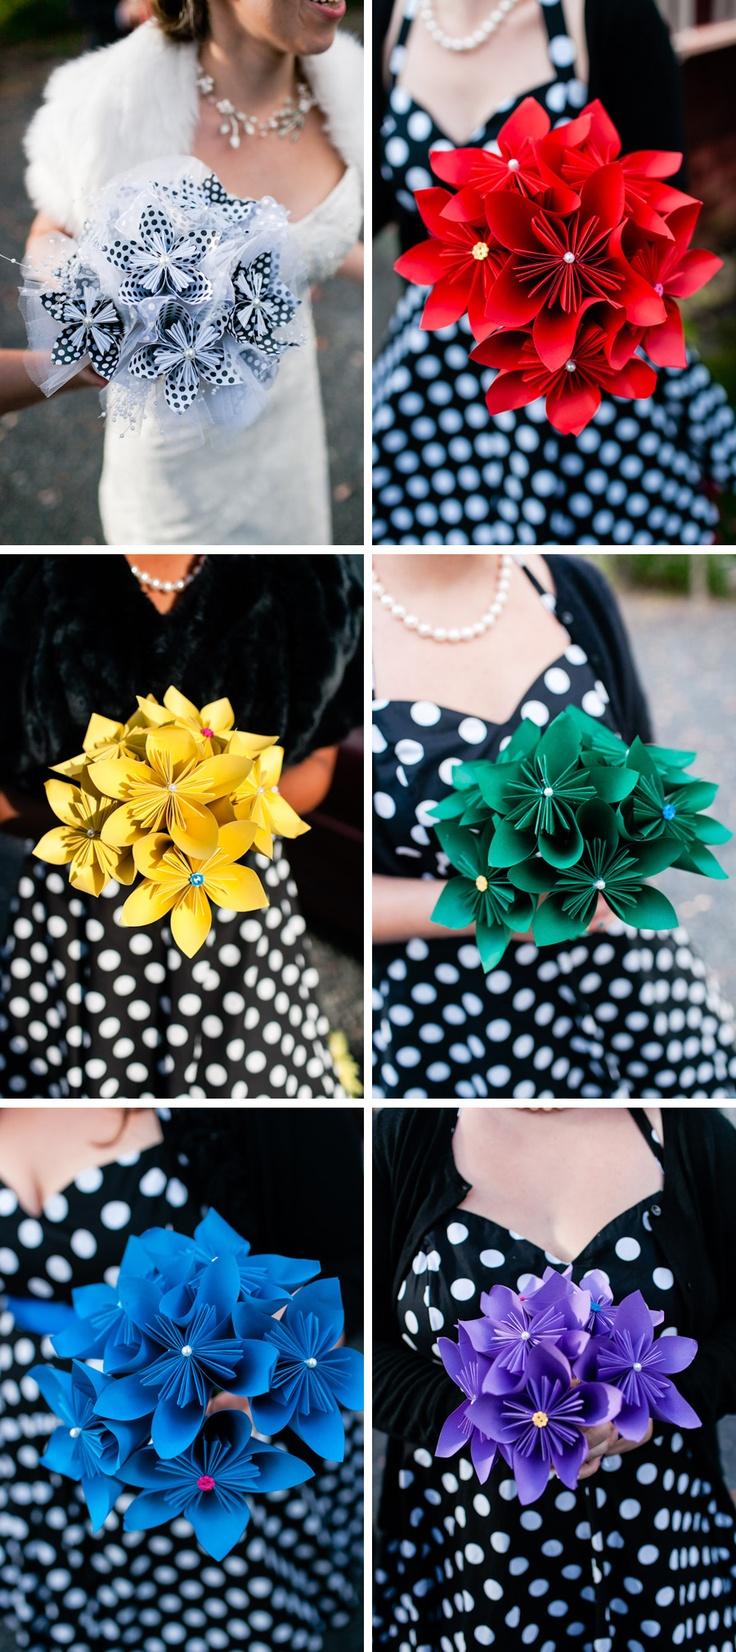 Best 25 origami bouquet ideas only on pinterest paper bouquet diy origami wedding bouquets photos by casey fatchett fatchett dhlflorist Image collections